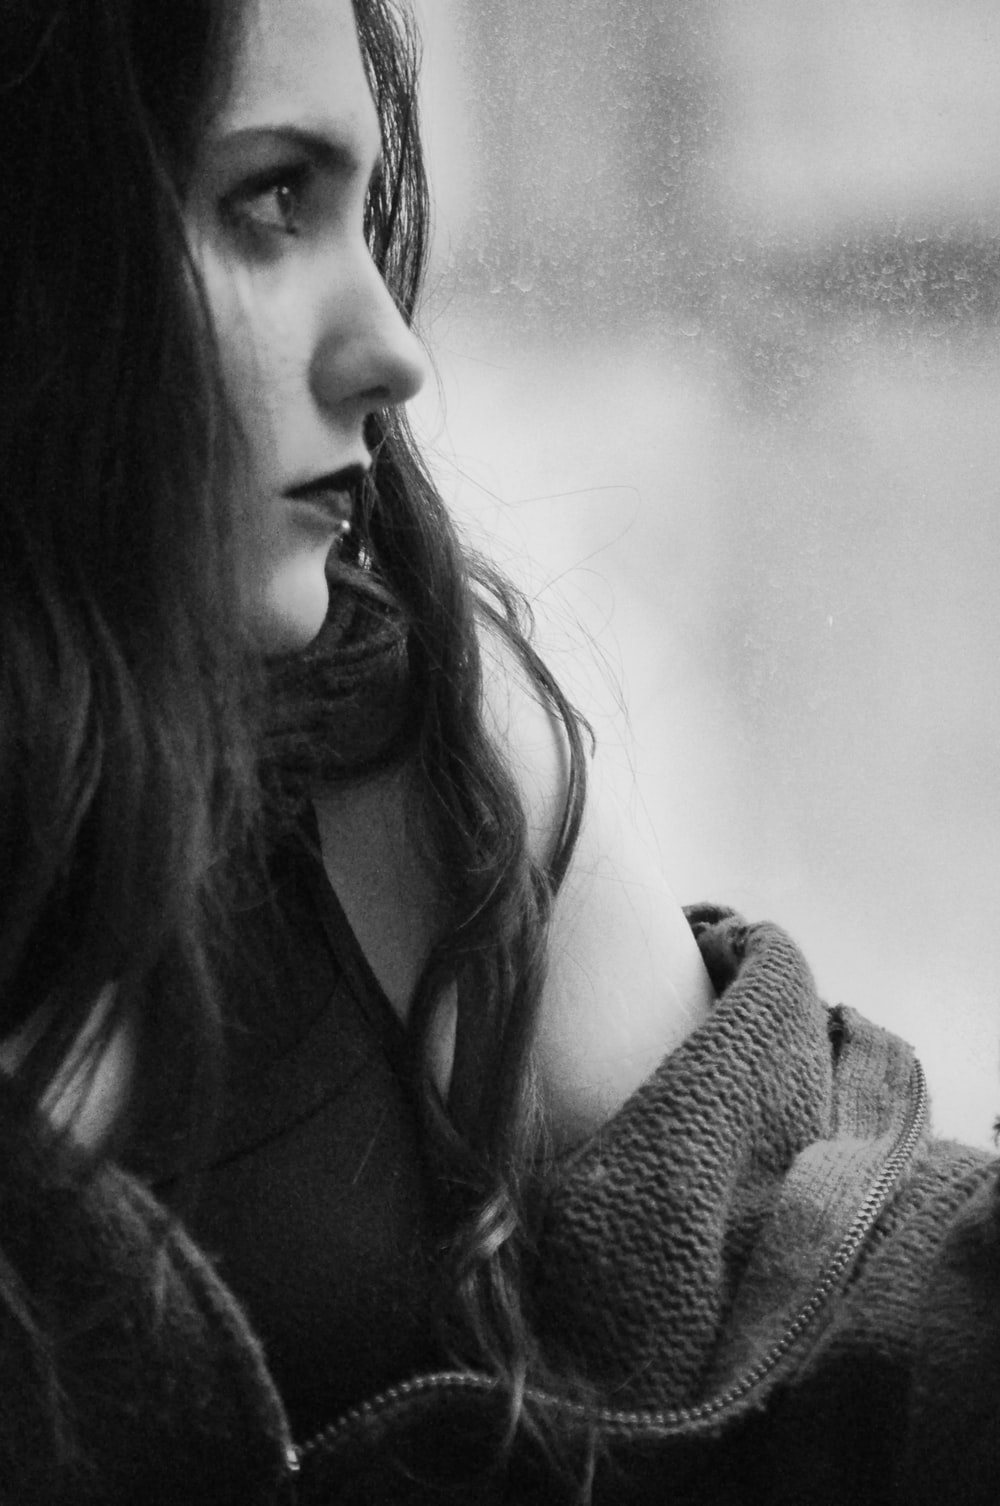 grayscale photography of woman looking upward near window